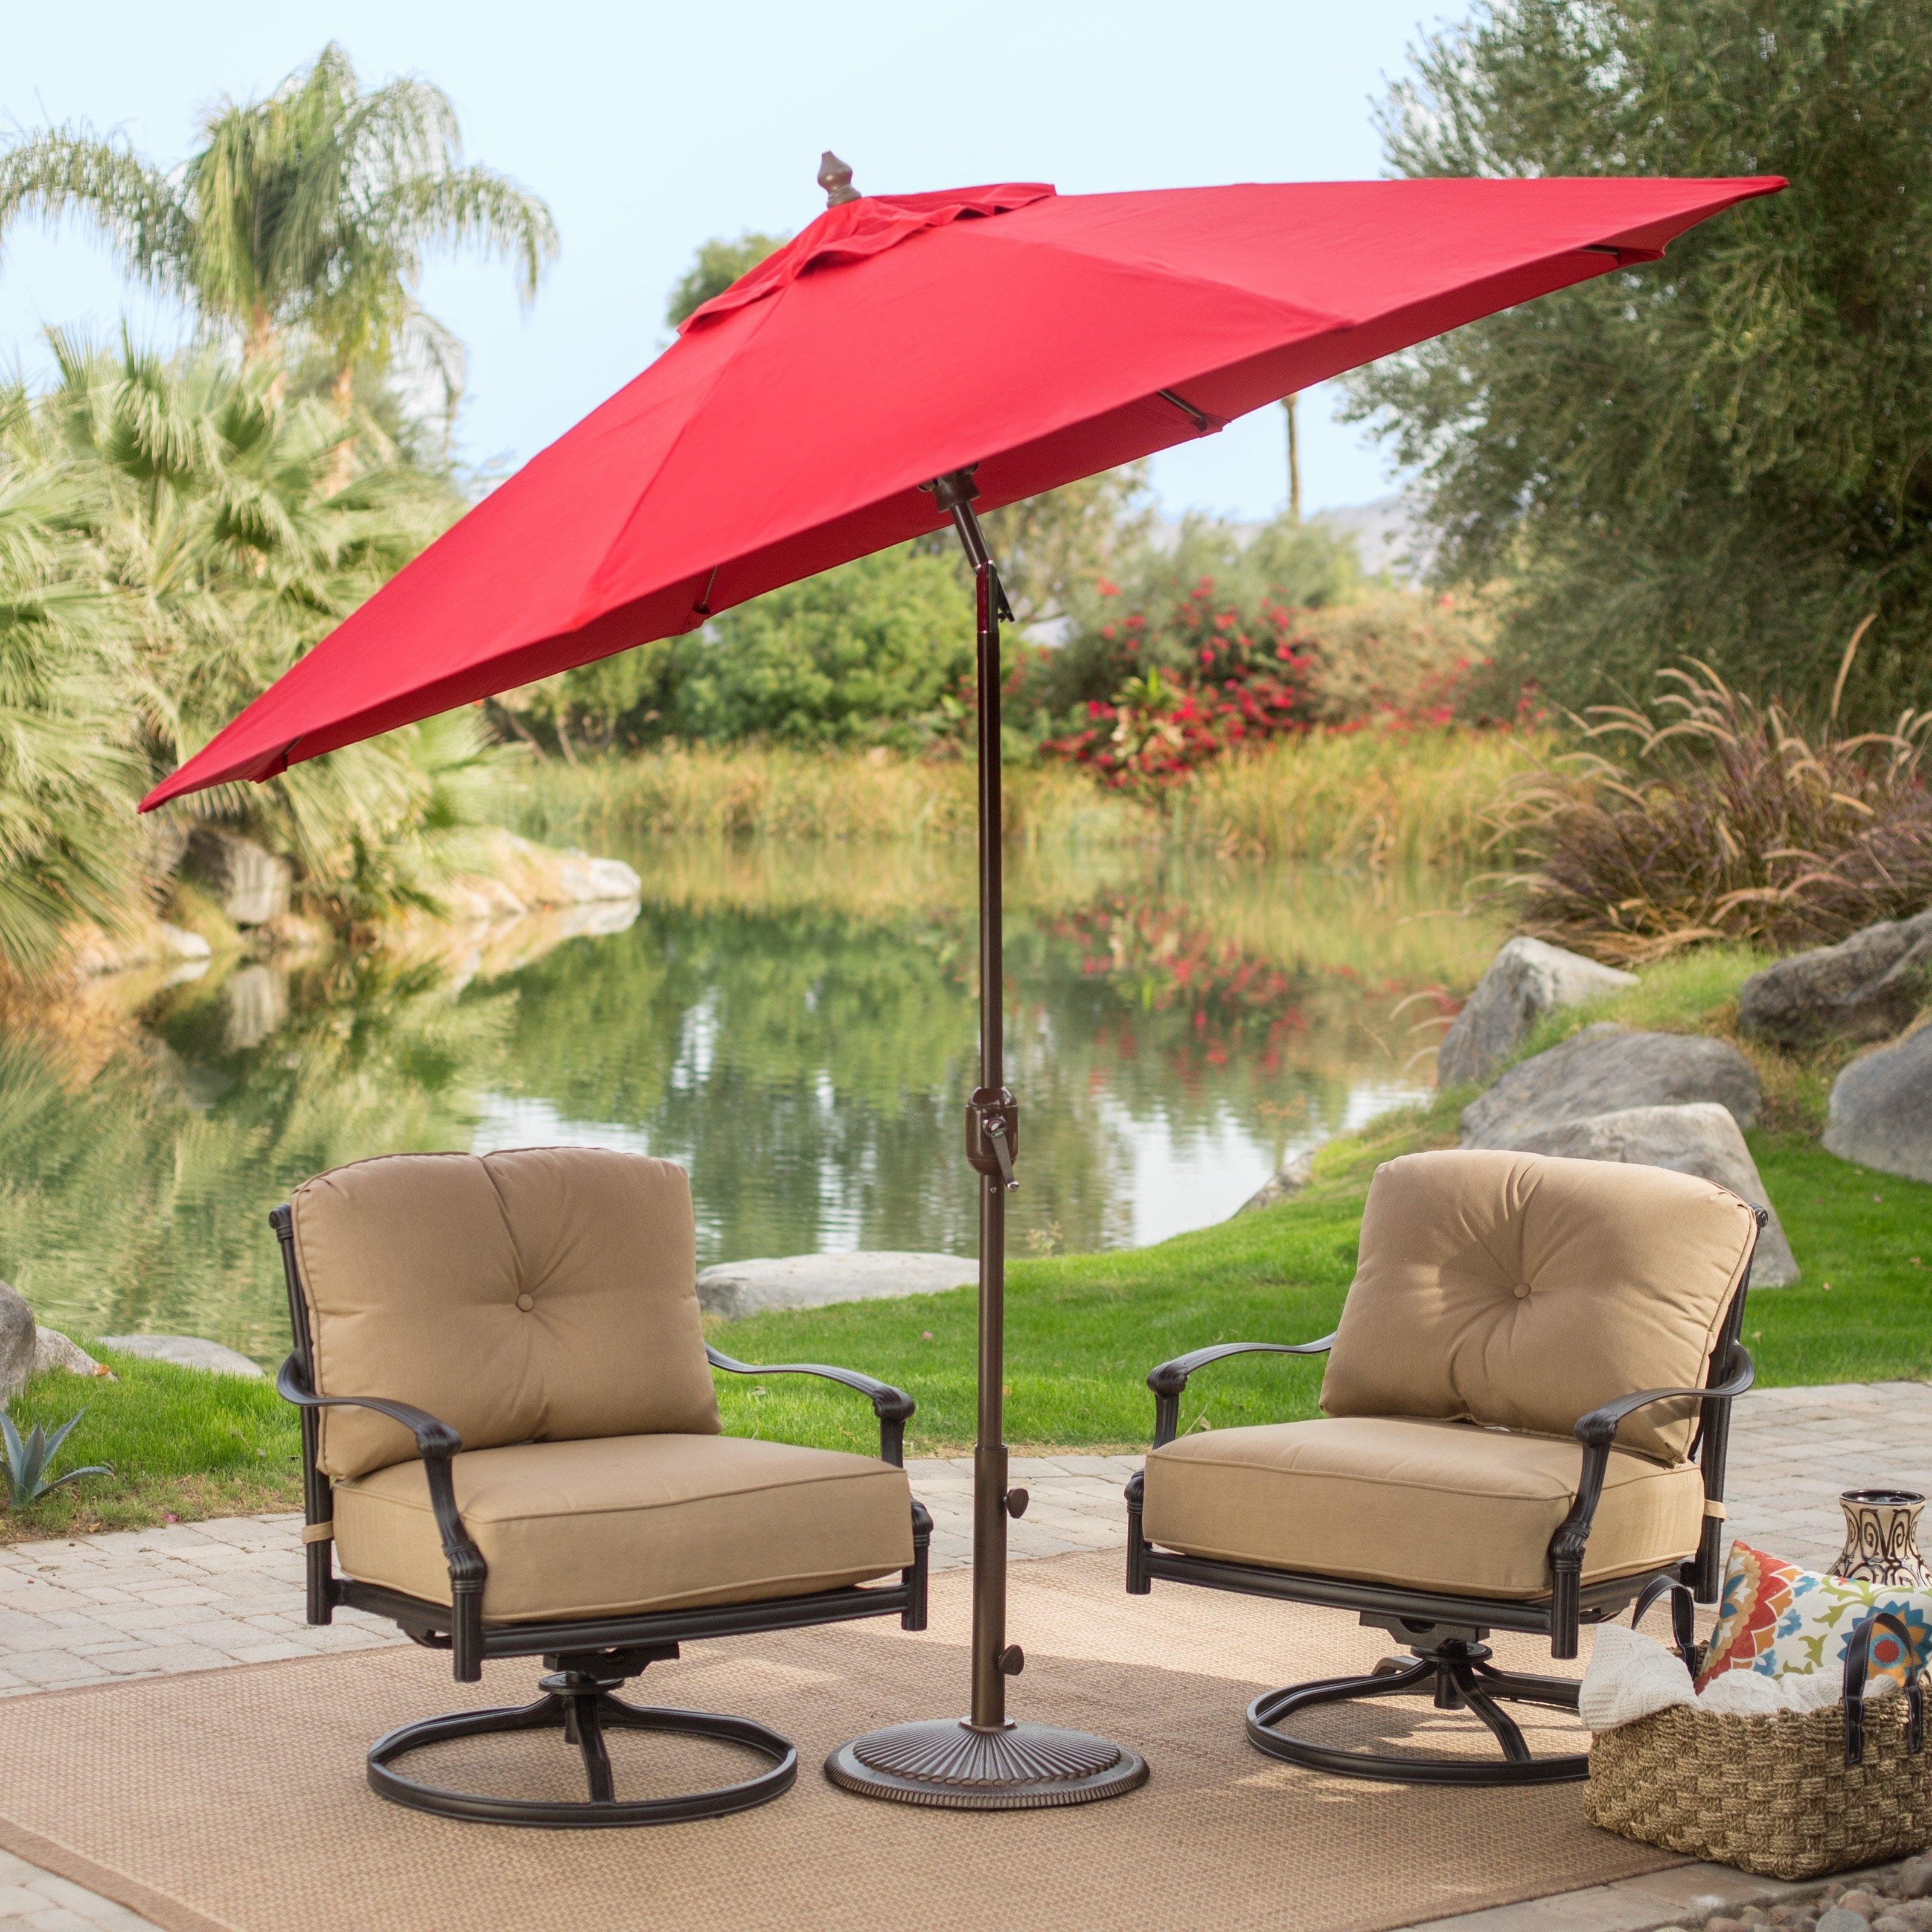 Patio Umbrella: Best Umbrella For You – Bellissimainteriors Regarding Well Known Cheap Patio Umbrellas (View 6 of 20)